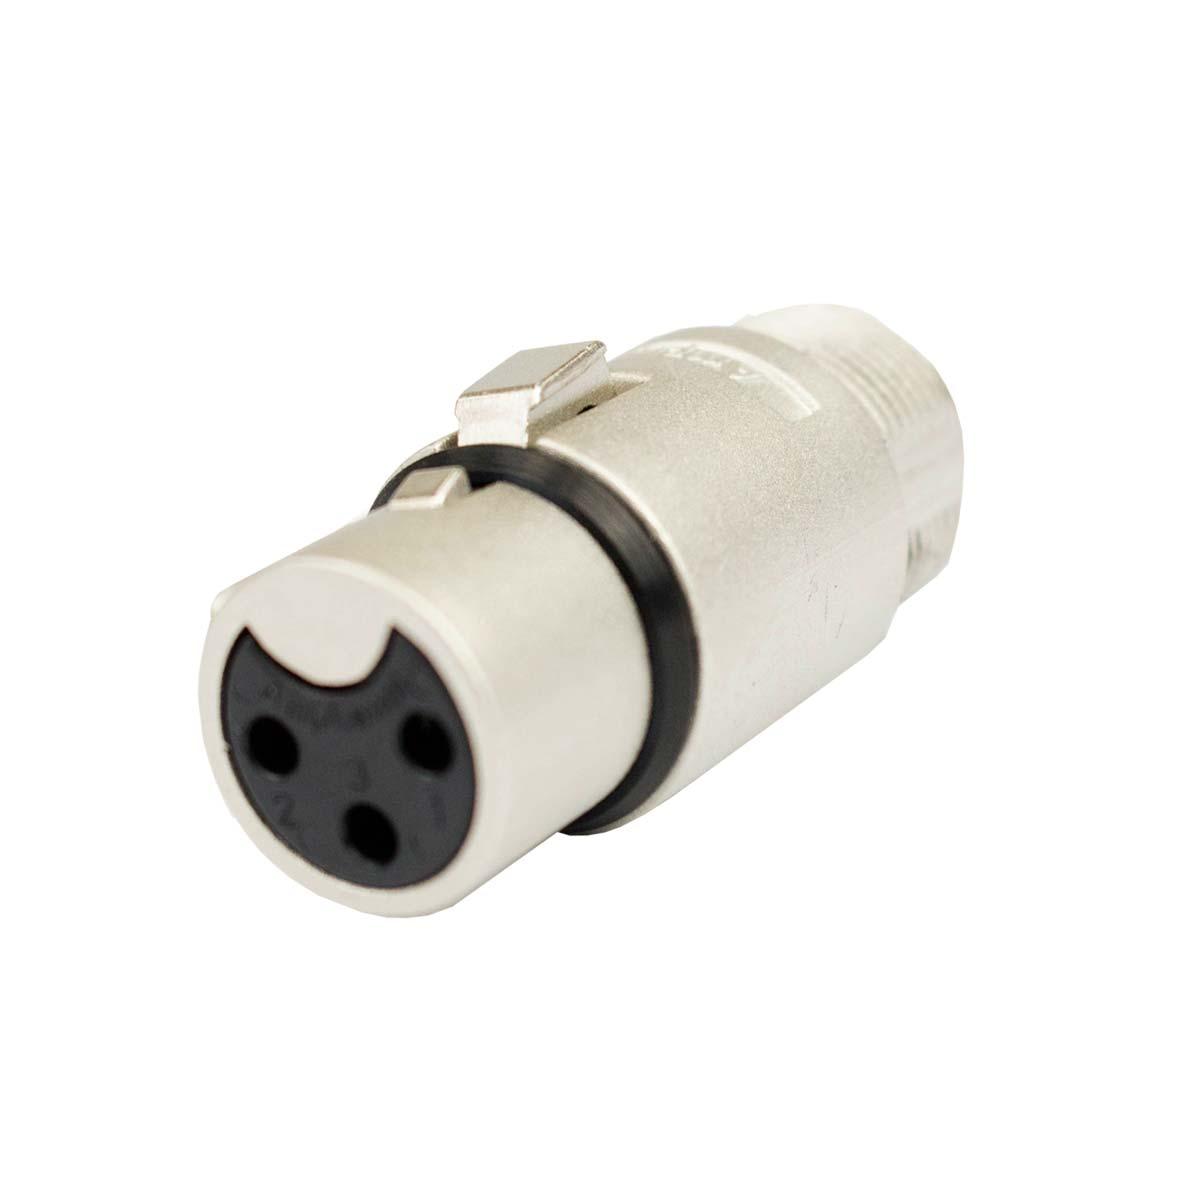 Conector XLR fêmea de linha AC3F Amphenol